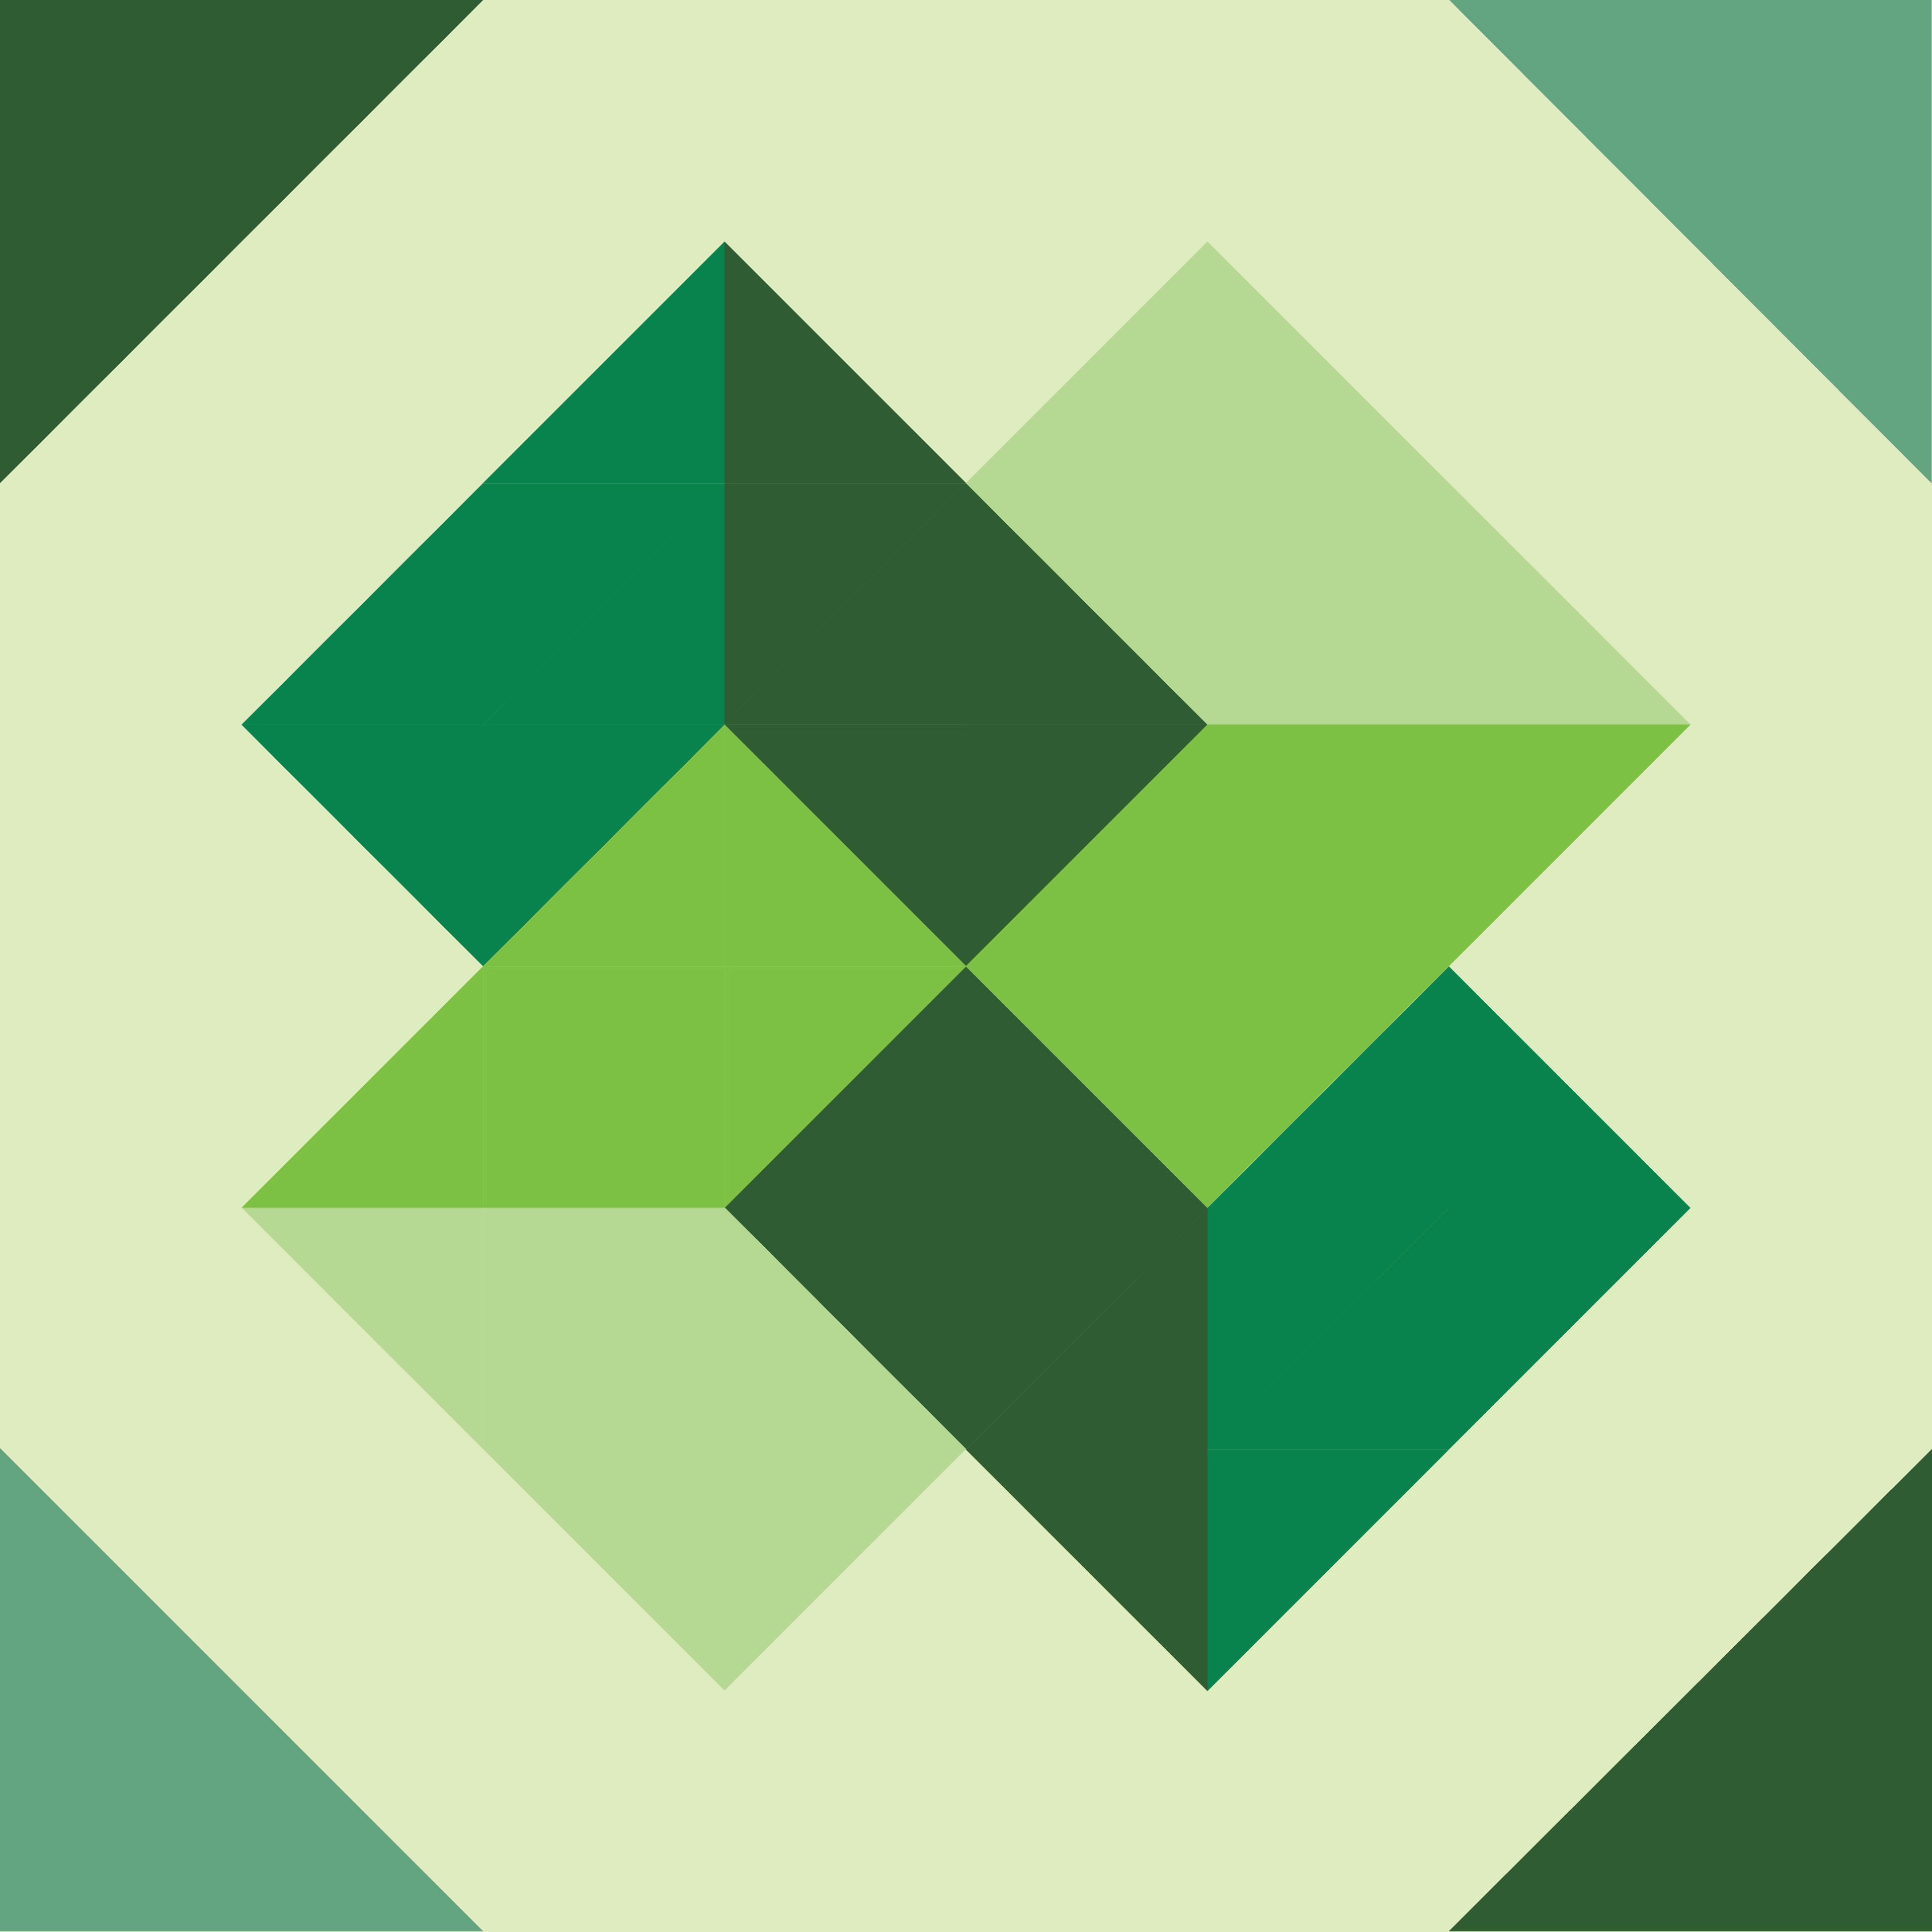 Quilt_RelationshipBuilding